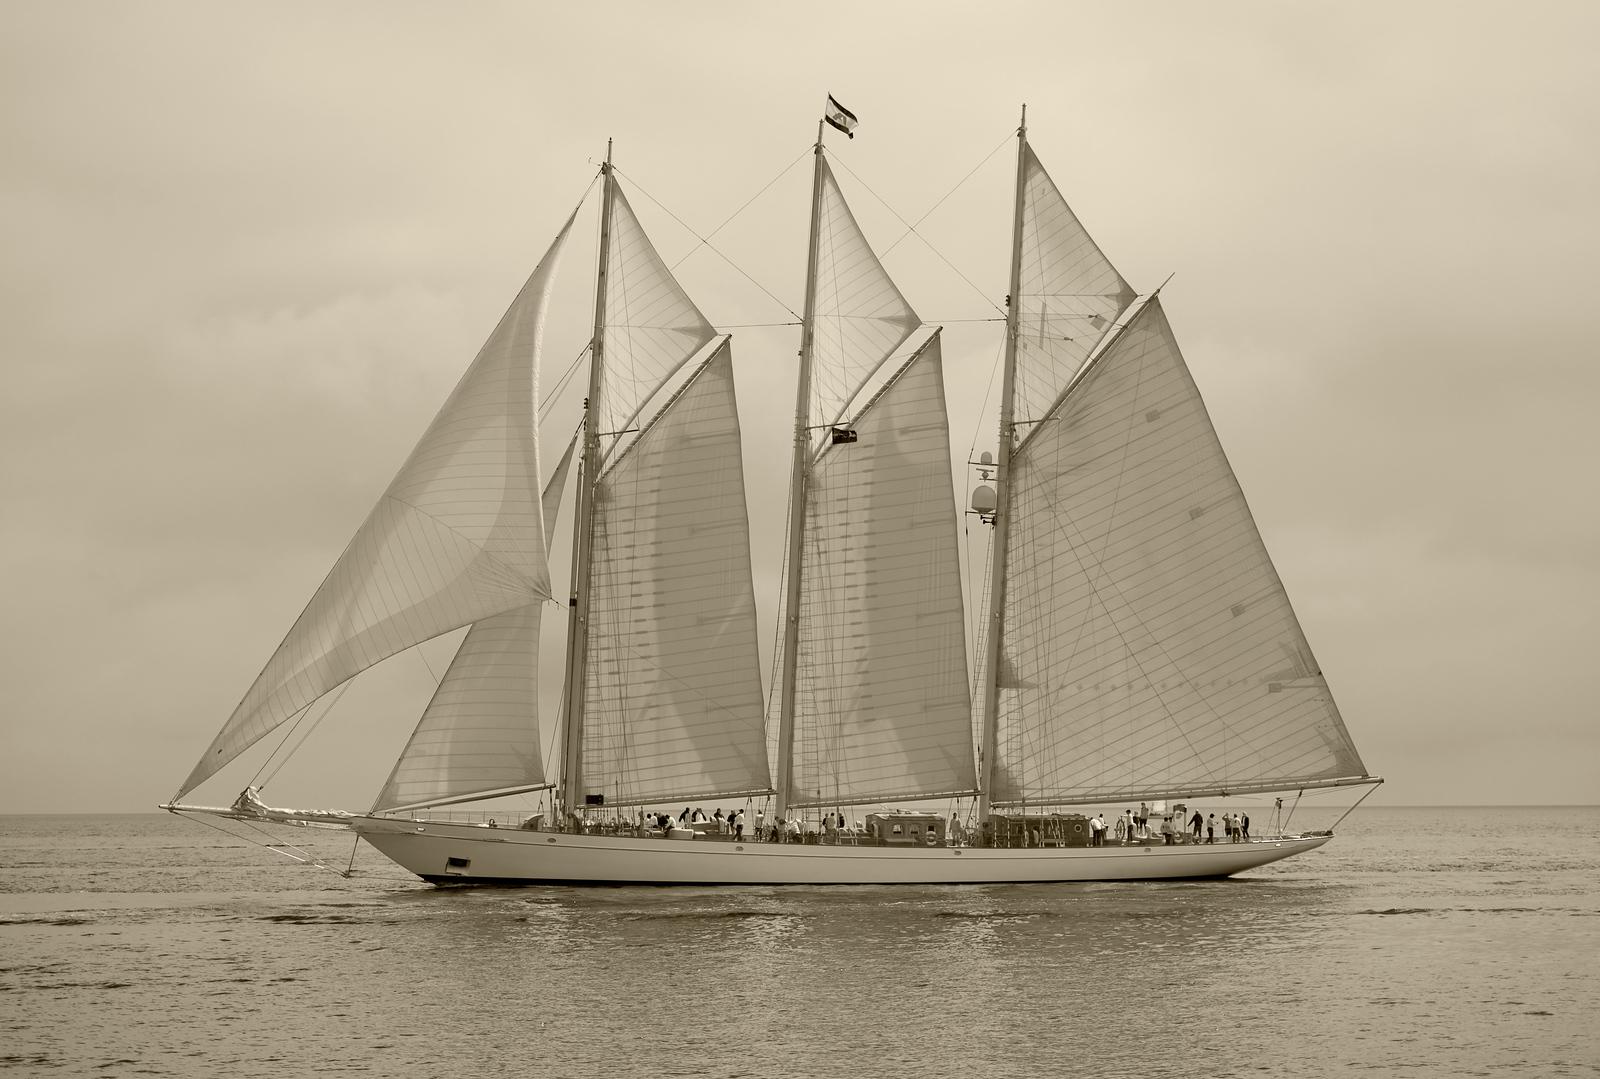 Adix, 65m three masted schooner.